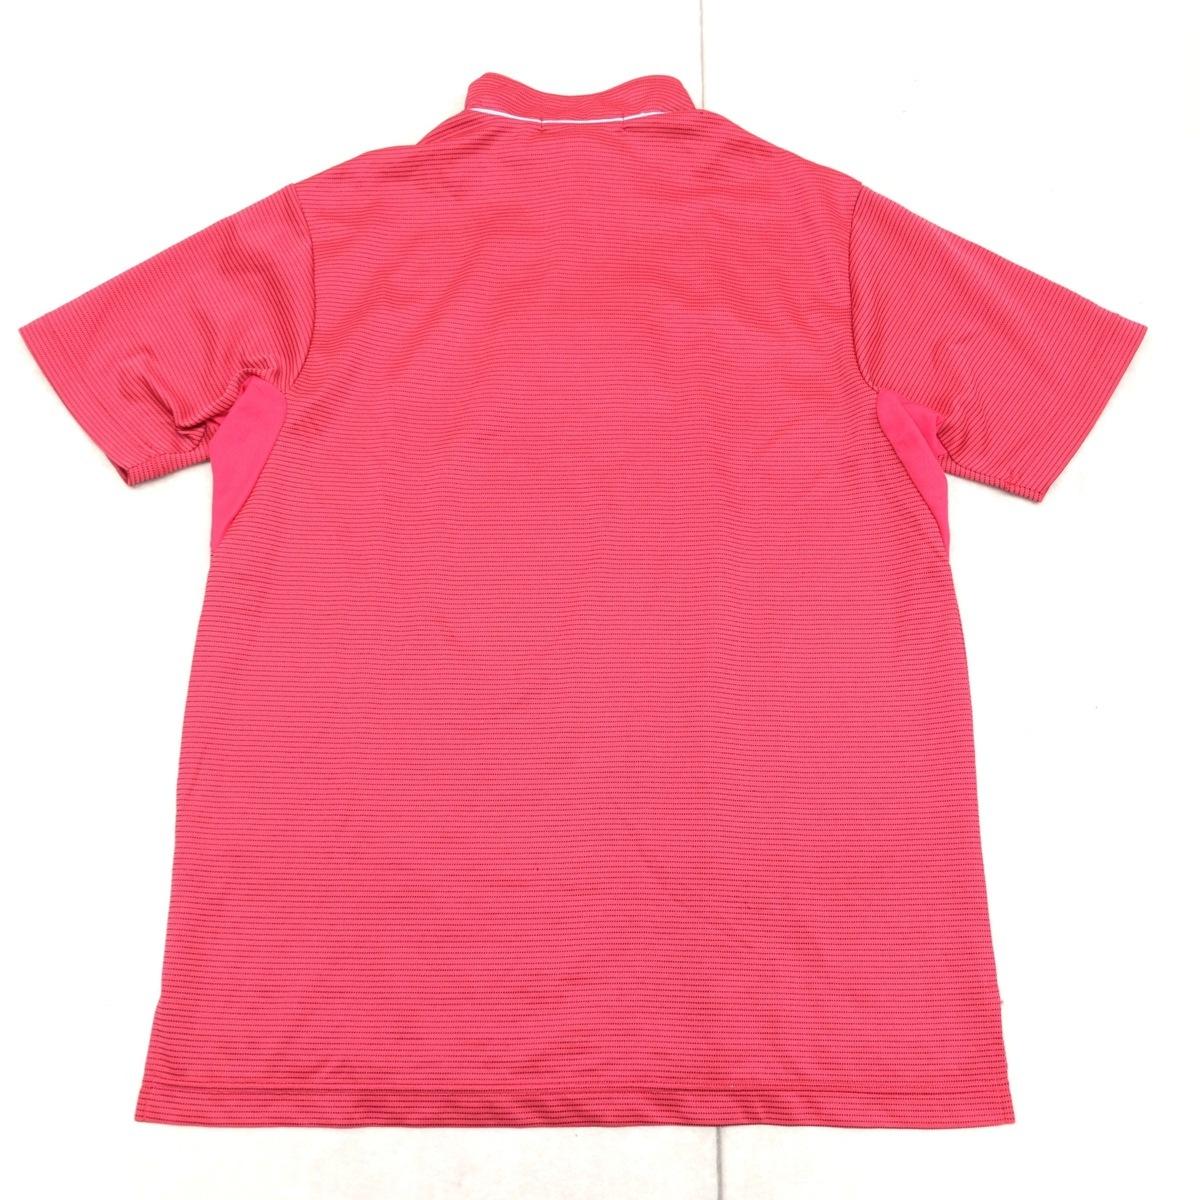 le coq sportif GOLF ルコックゴルフ 吸汗速乾 ロゴ刺繍 ハーフジップ ドライ ゴルフシャツ M ピンク メンズ 半袖 ボーダー 国内正規品_画像2